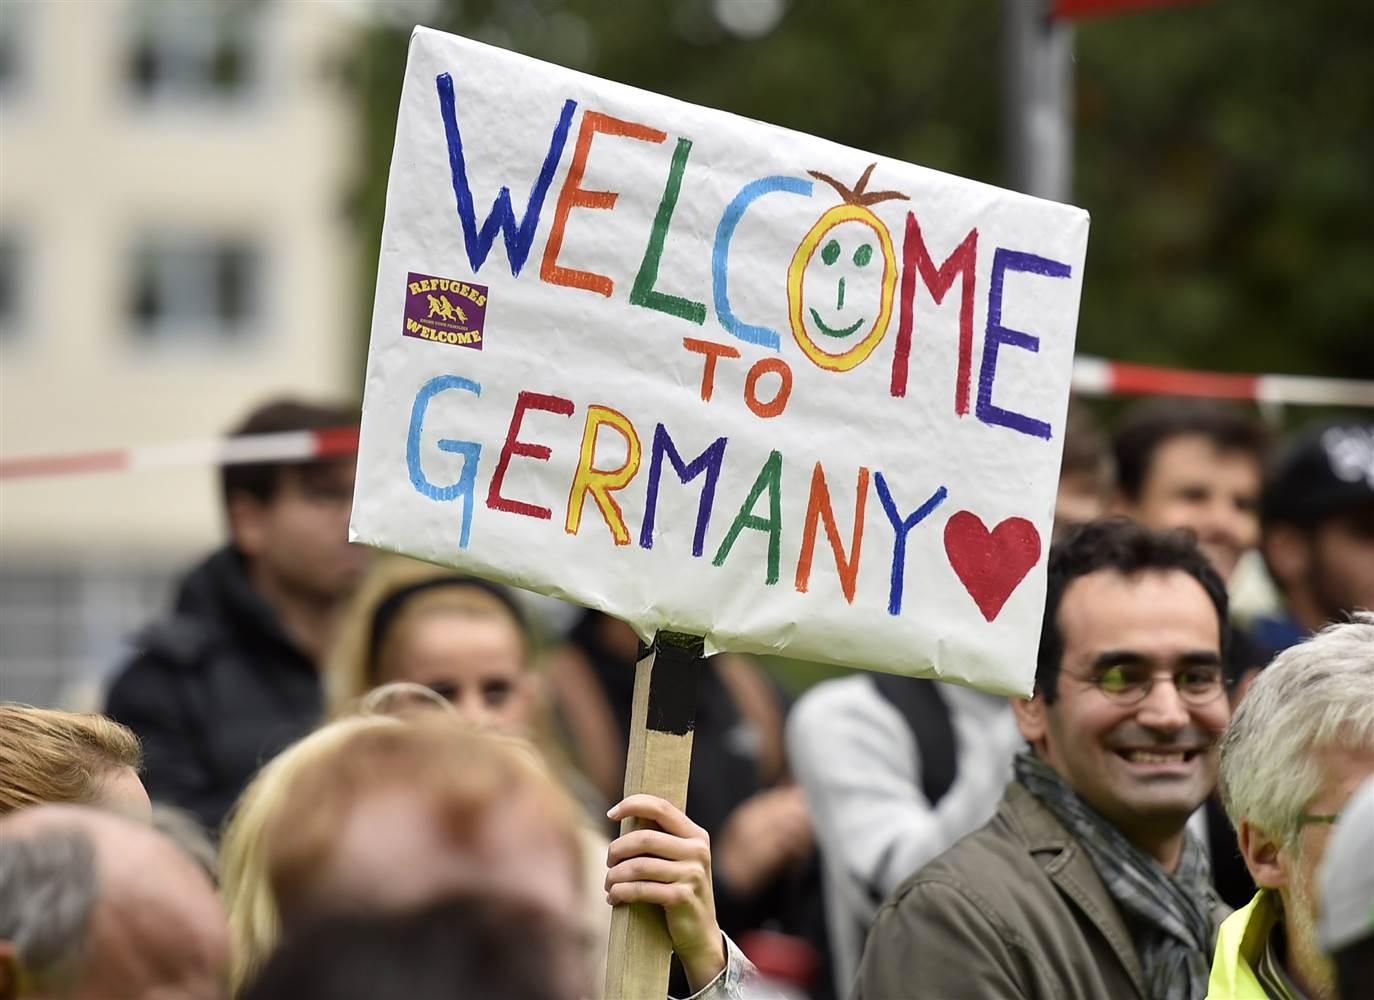 150906 germany migrants hg 1149_c84baa1a147301b74ce5ddd8010c9694 nbcnews ux 2880